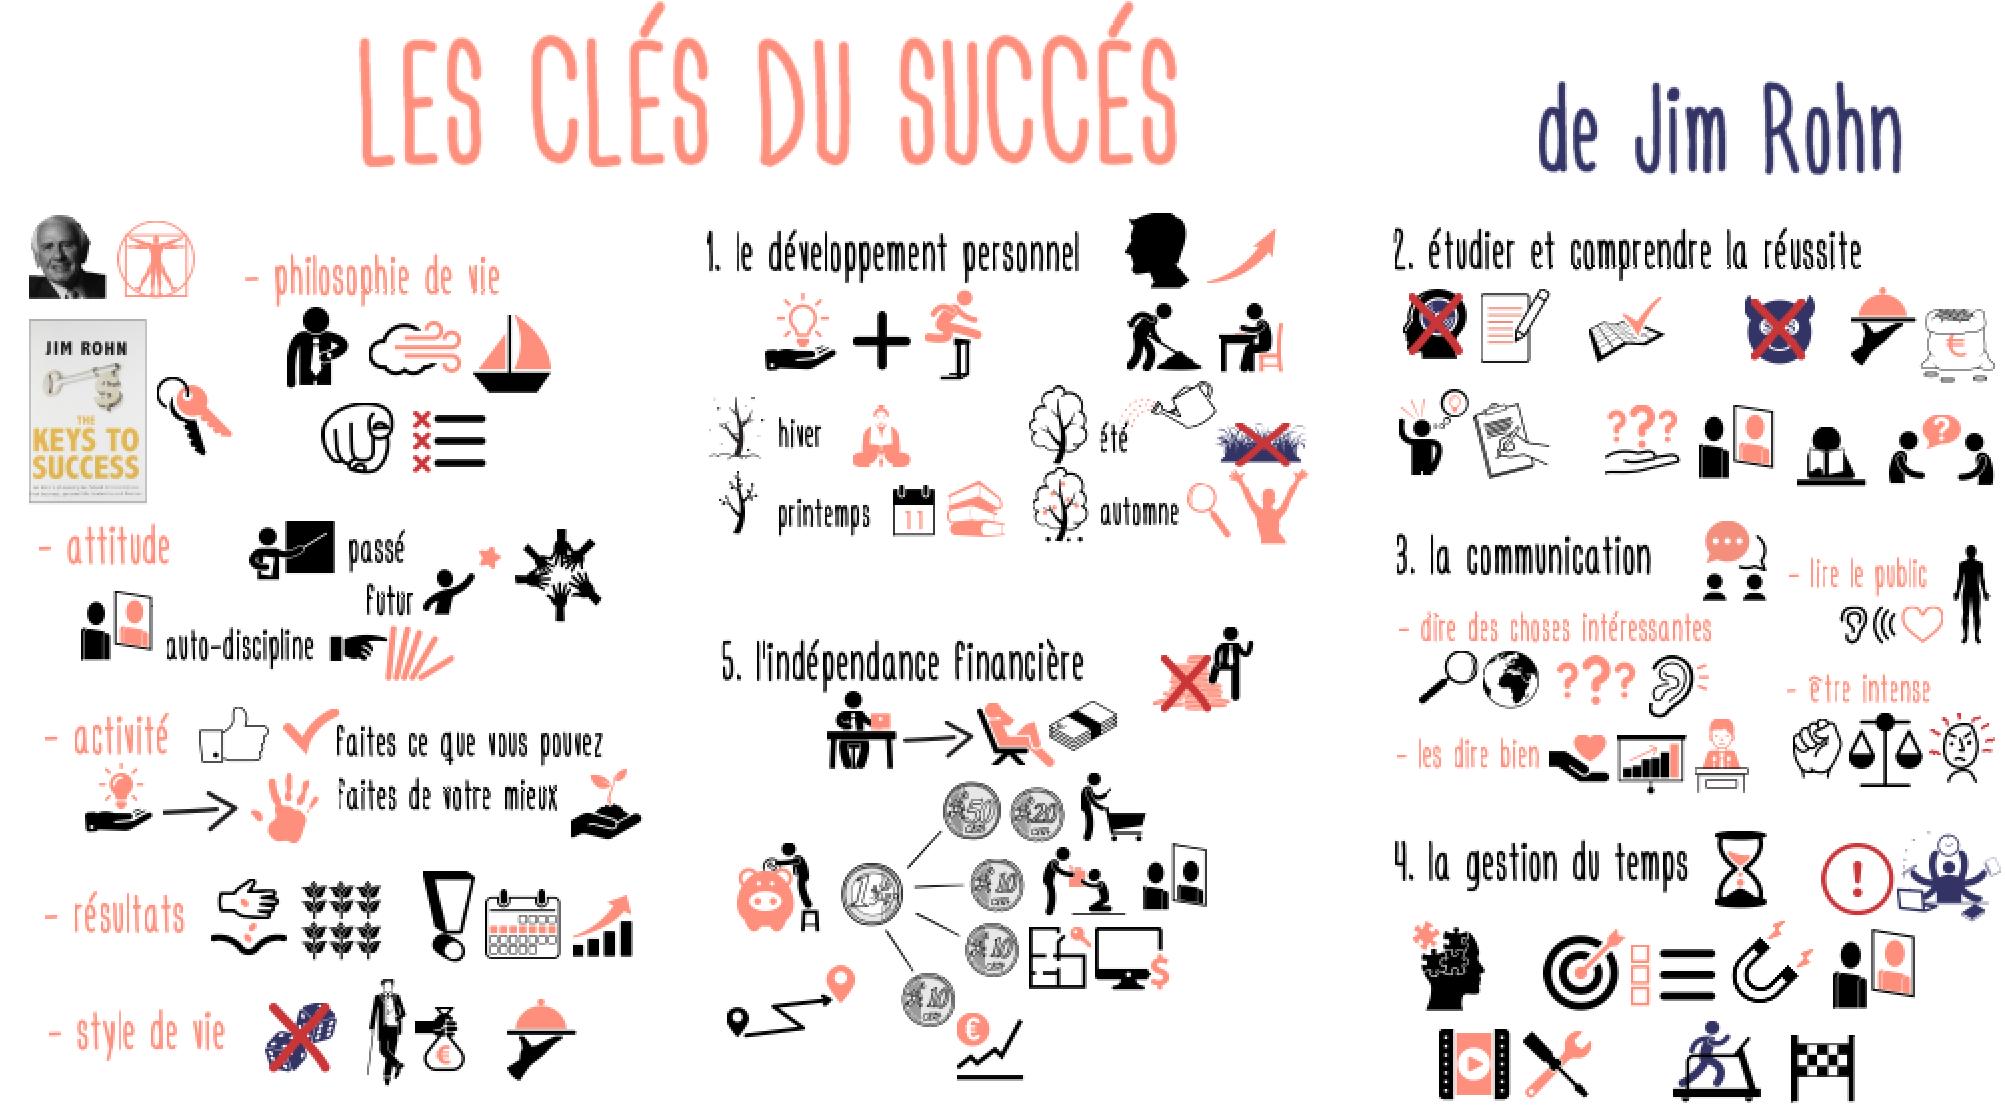 ClesDuSucces